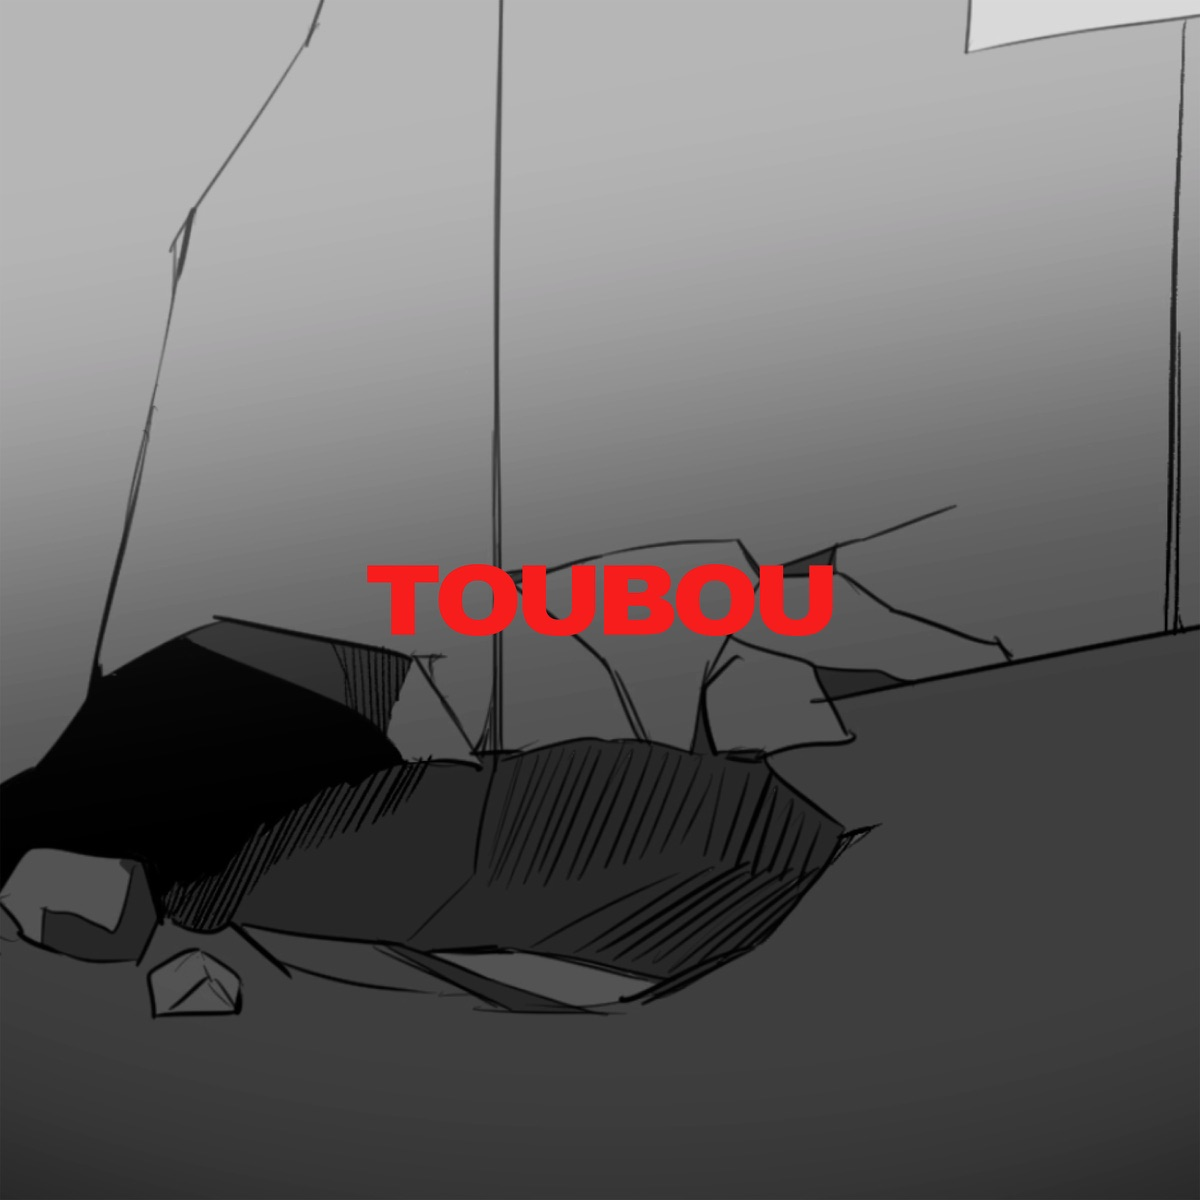 『DUSTCELL - TOUBOU』収録の『TOUBOU』ジャケット